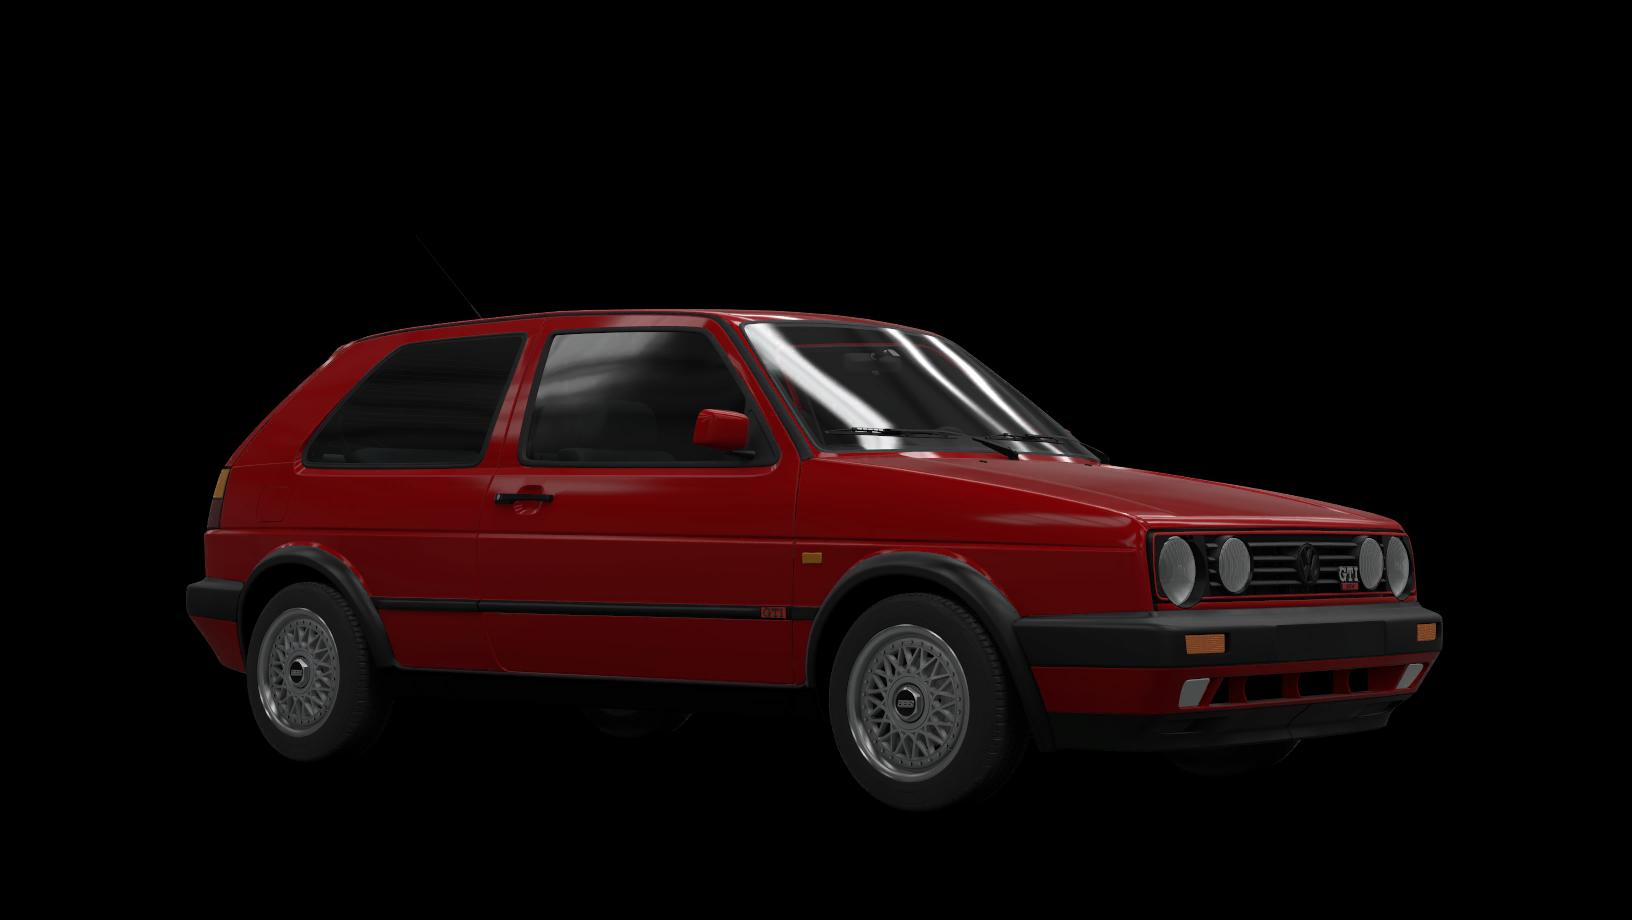 Volkswagen Golf Gti 16v Mk2 Forza Wiki Fandom